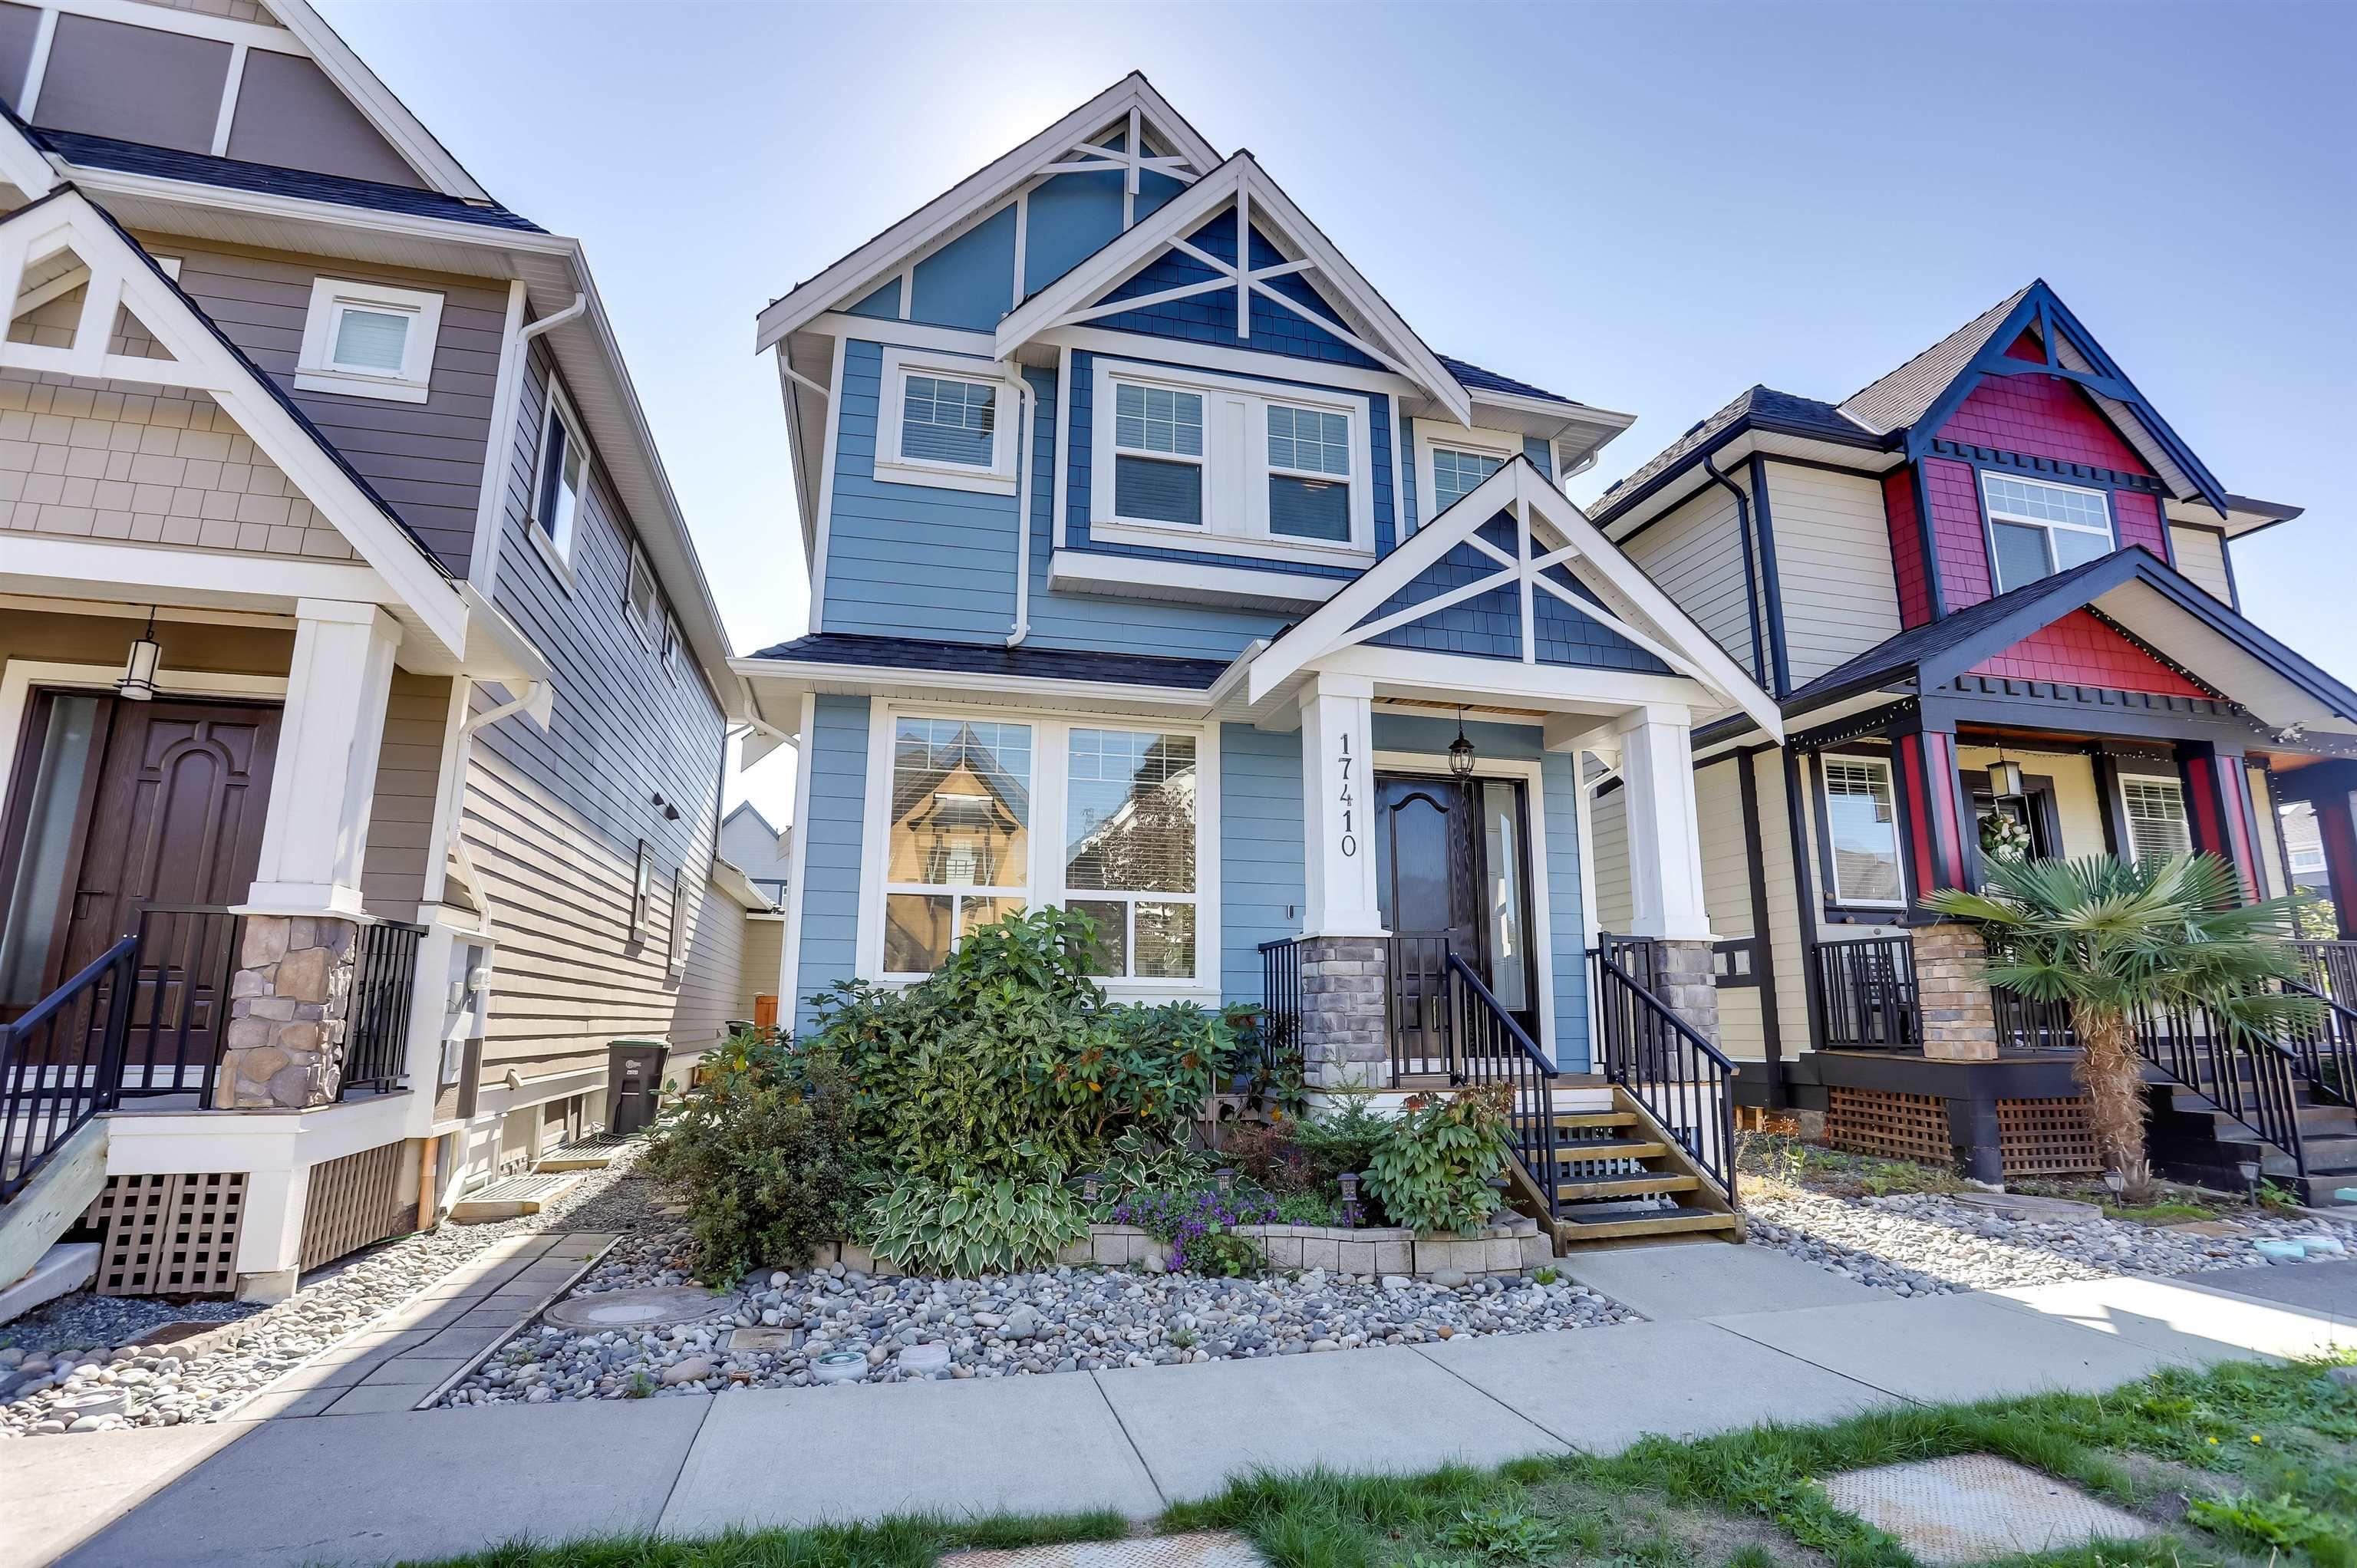 Main Photo: 17410 2B Avenue in Surrey: Pacific Douglas House for sale (South Surrey White Rock)  : MLS®# R2621126